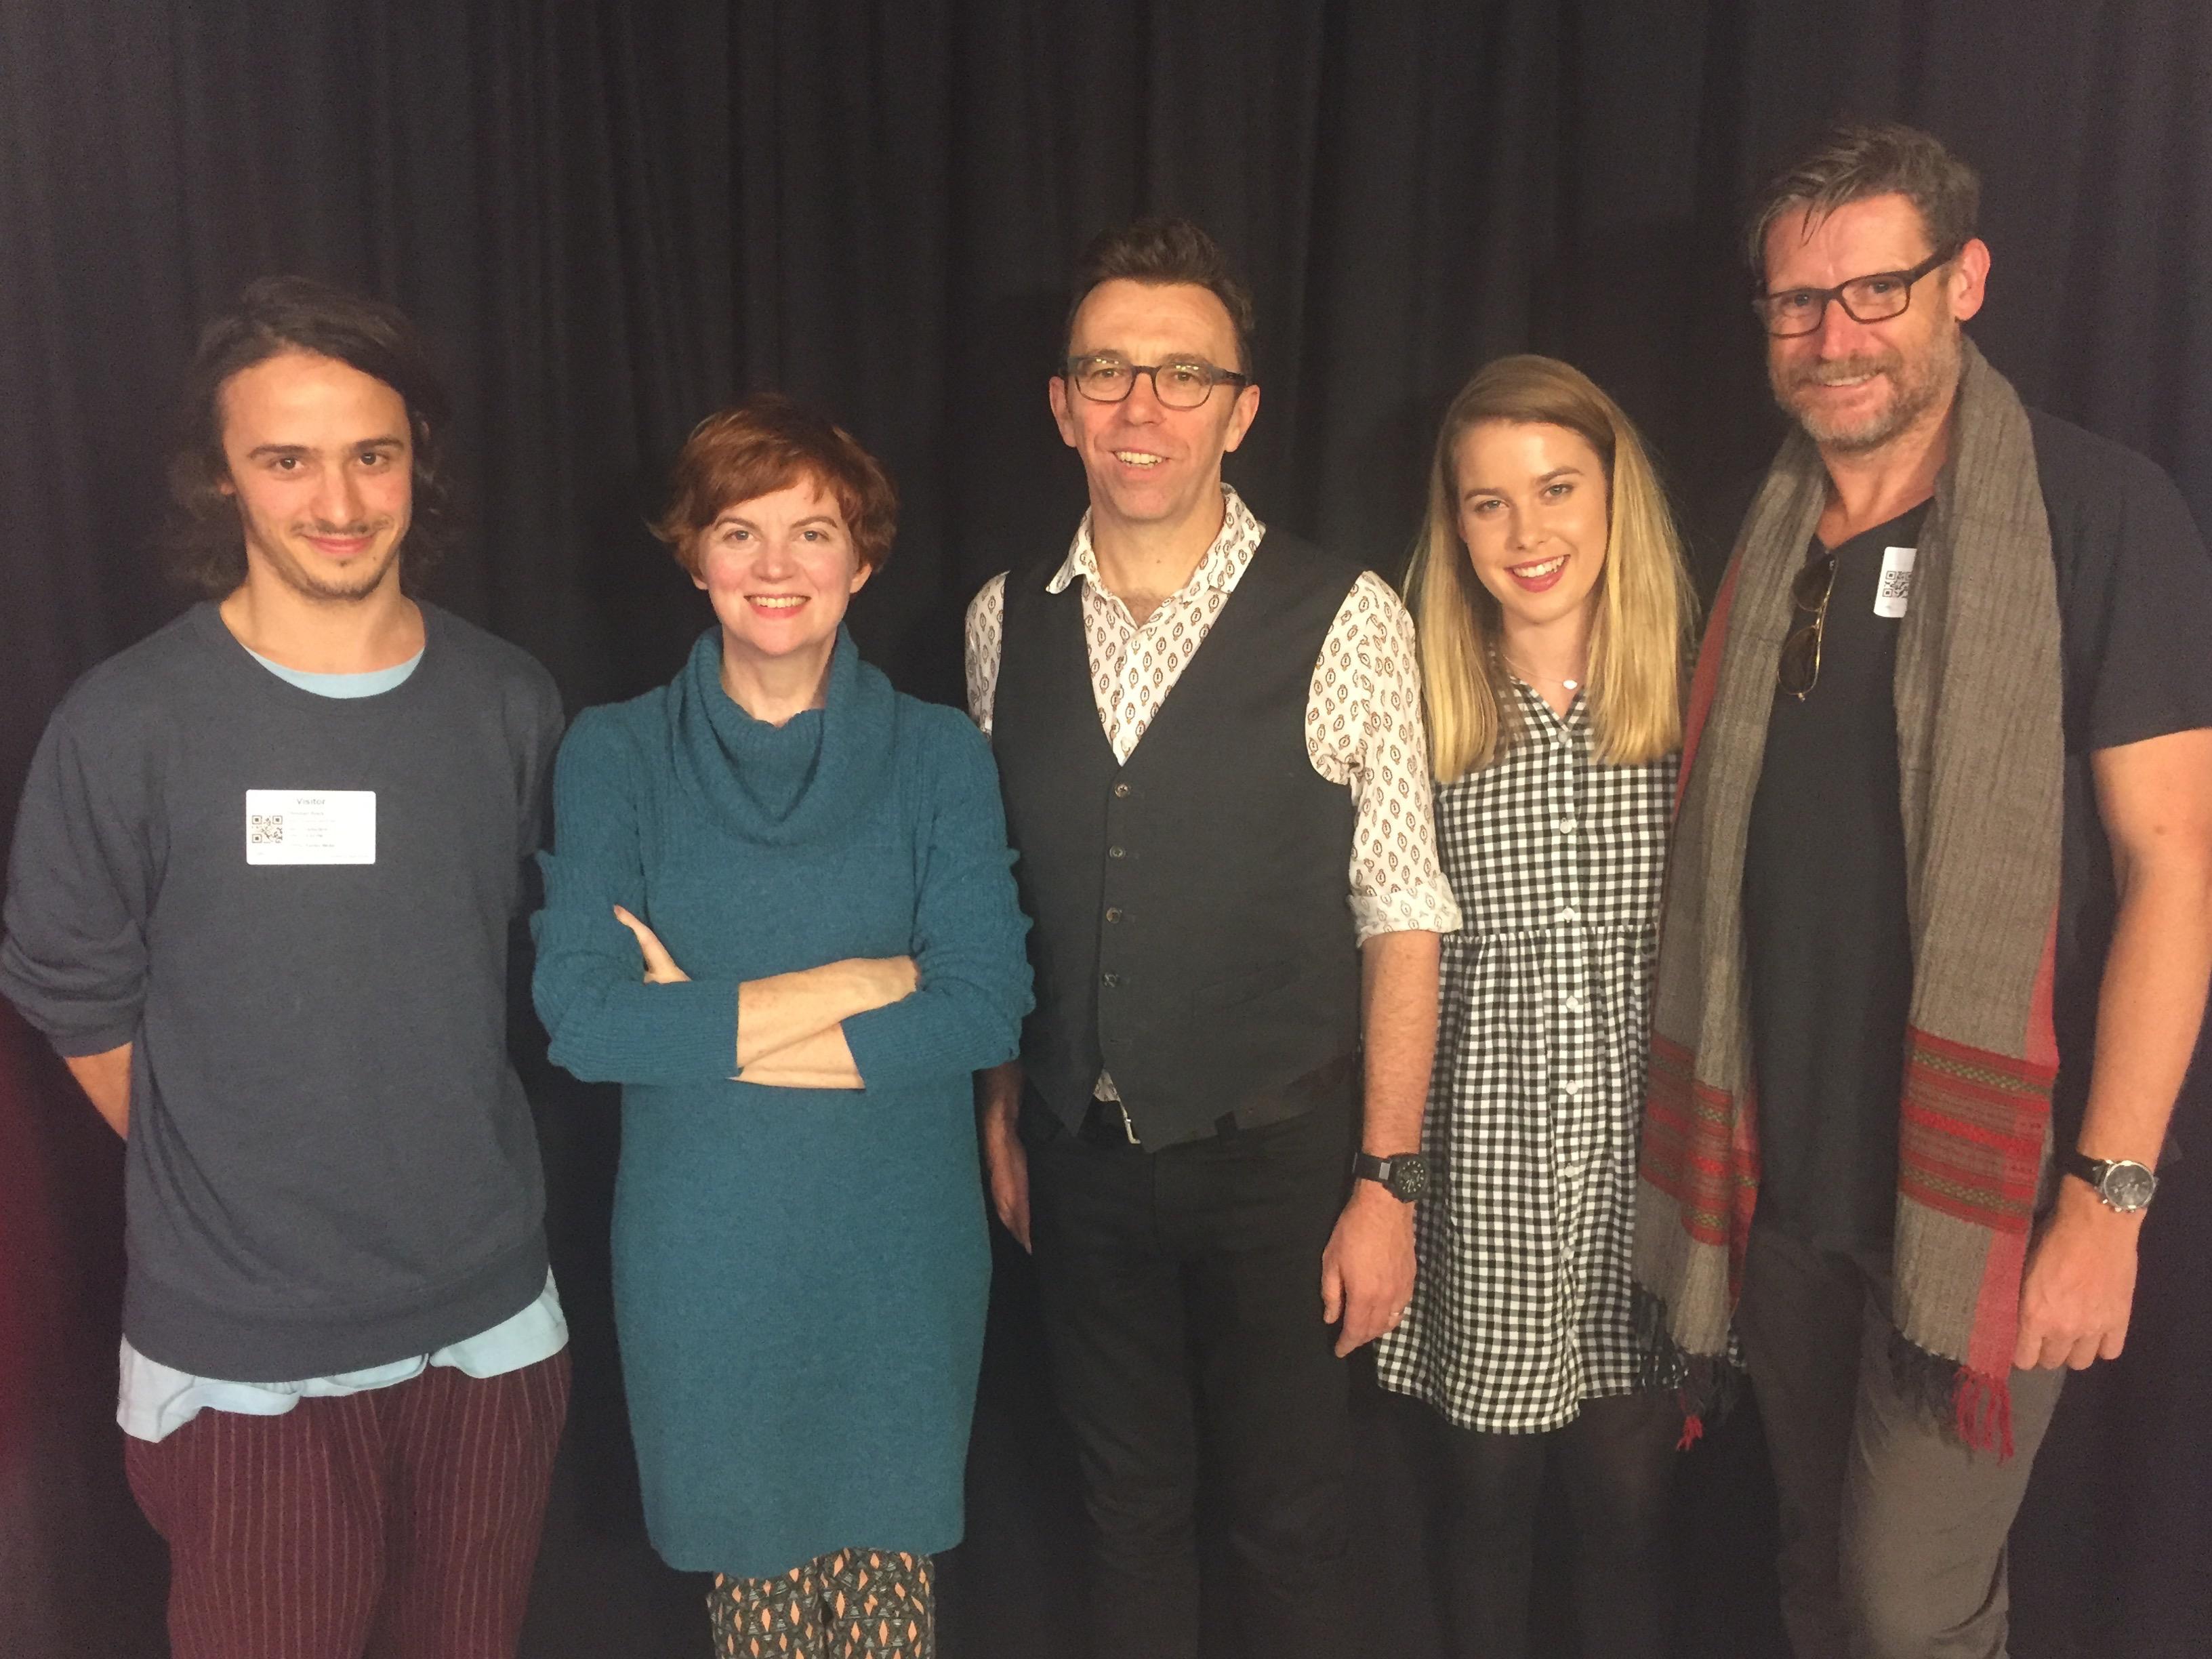 (L-R) Christian Byers, Sofya Gollan, Karl Quinn, Bridie McKim, Morgan Smallbone at Fairfax Media to discuss 'Gimpsey'